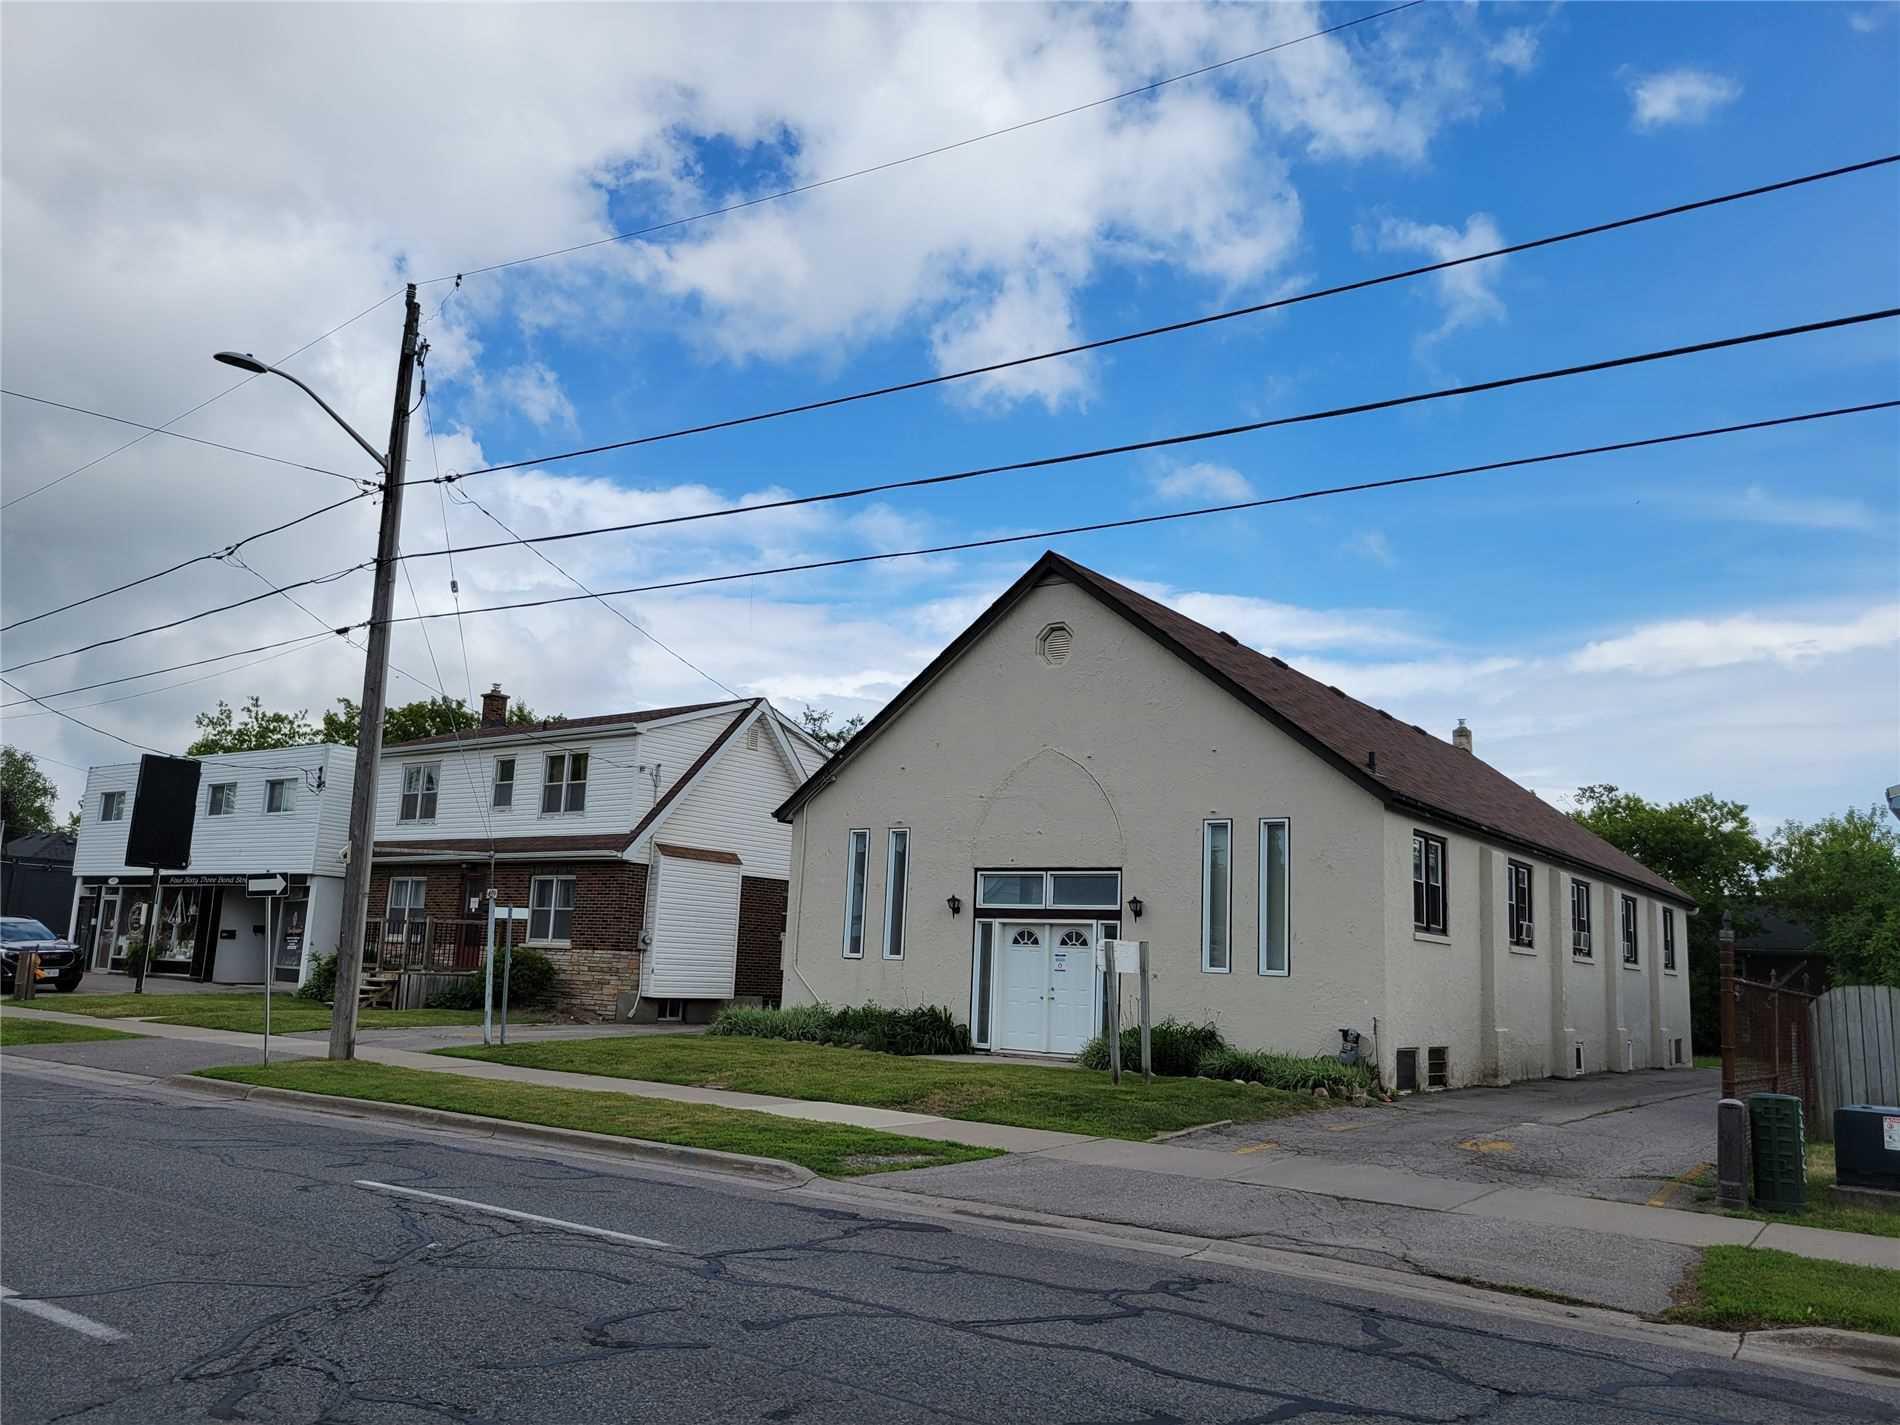 455 Bond St, Oshawa, Ontario L1G 1B9, ,2 BathroomsBathrooms,Office,For Sale,Bond,E5273206